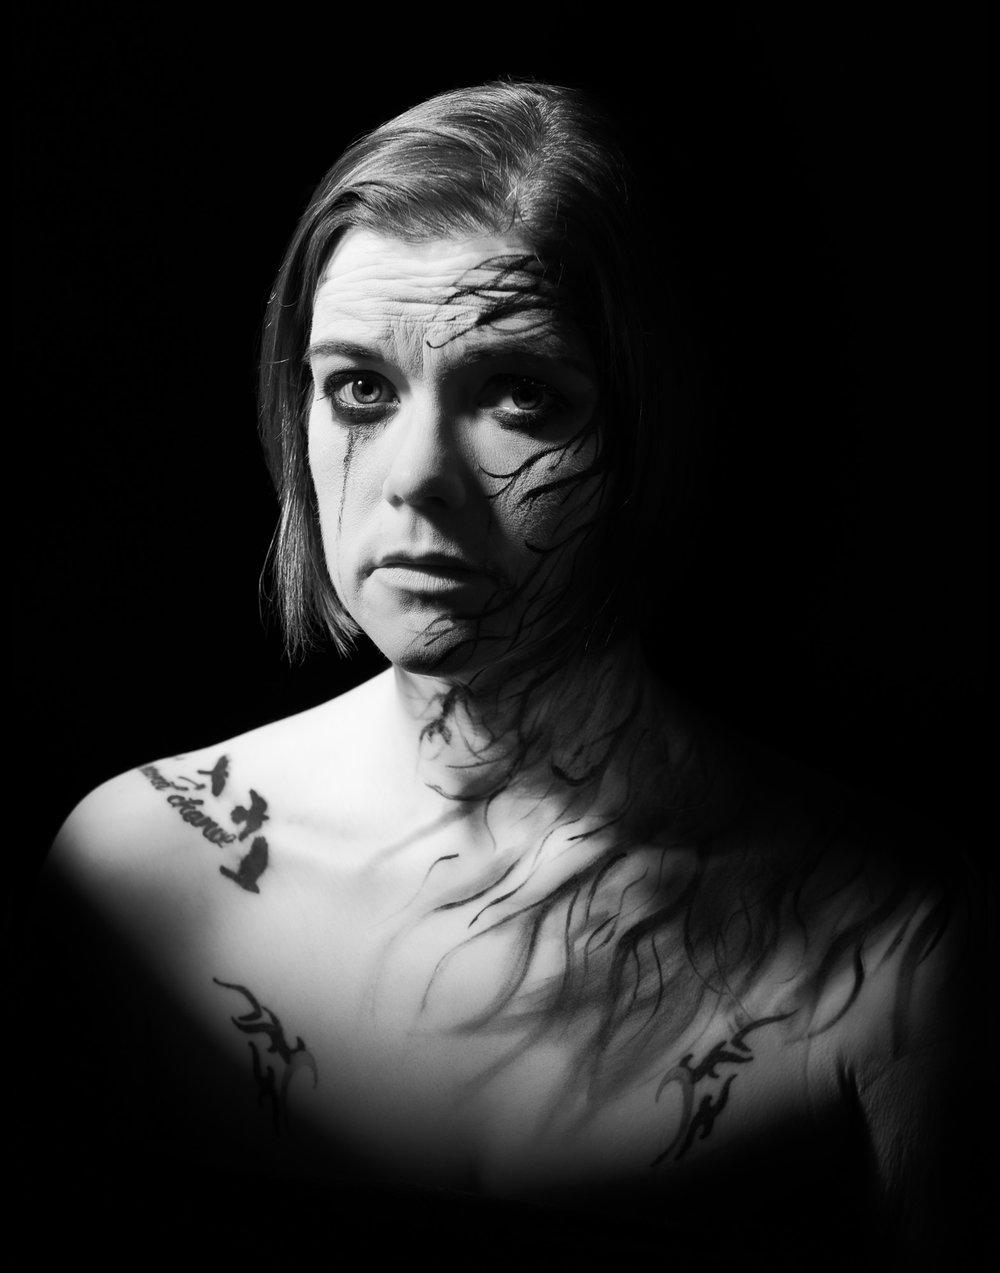 PortraitPortfolio-13.jpg